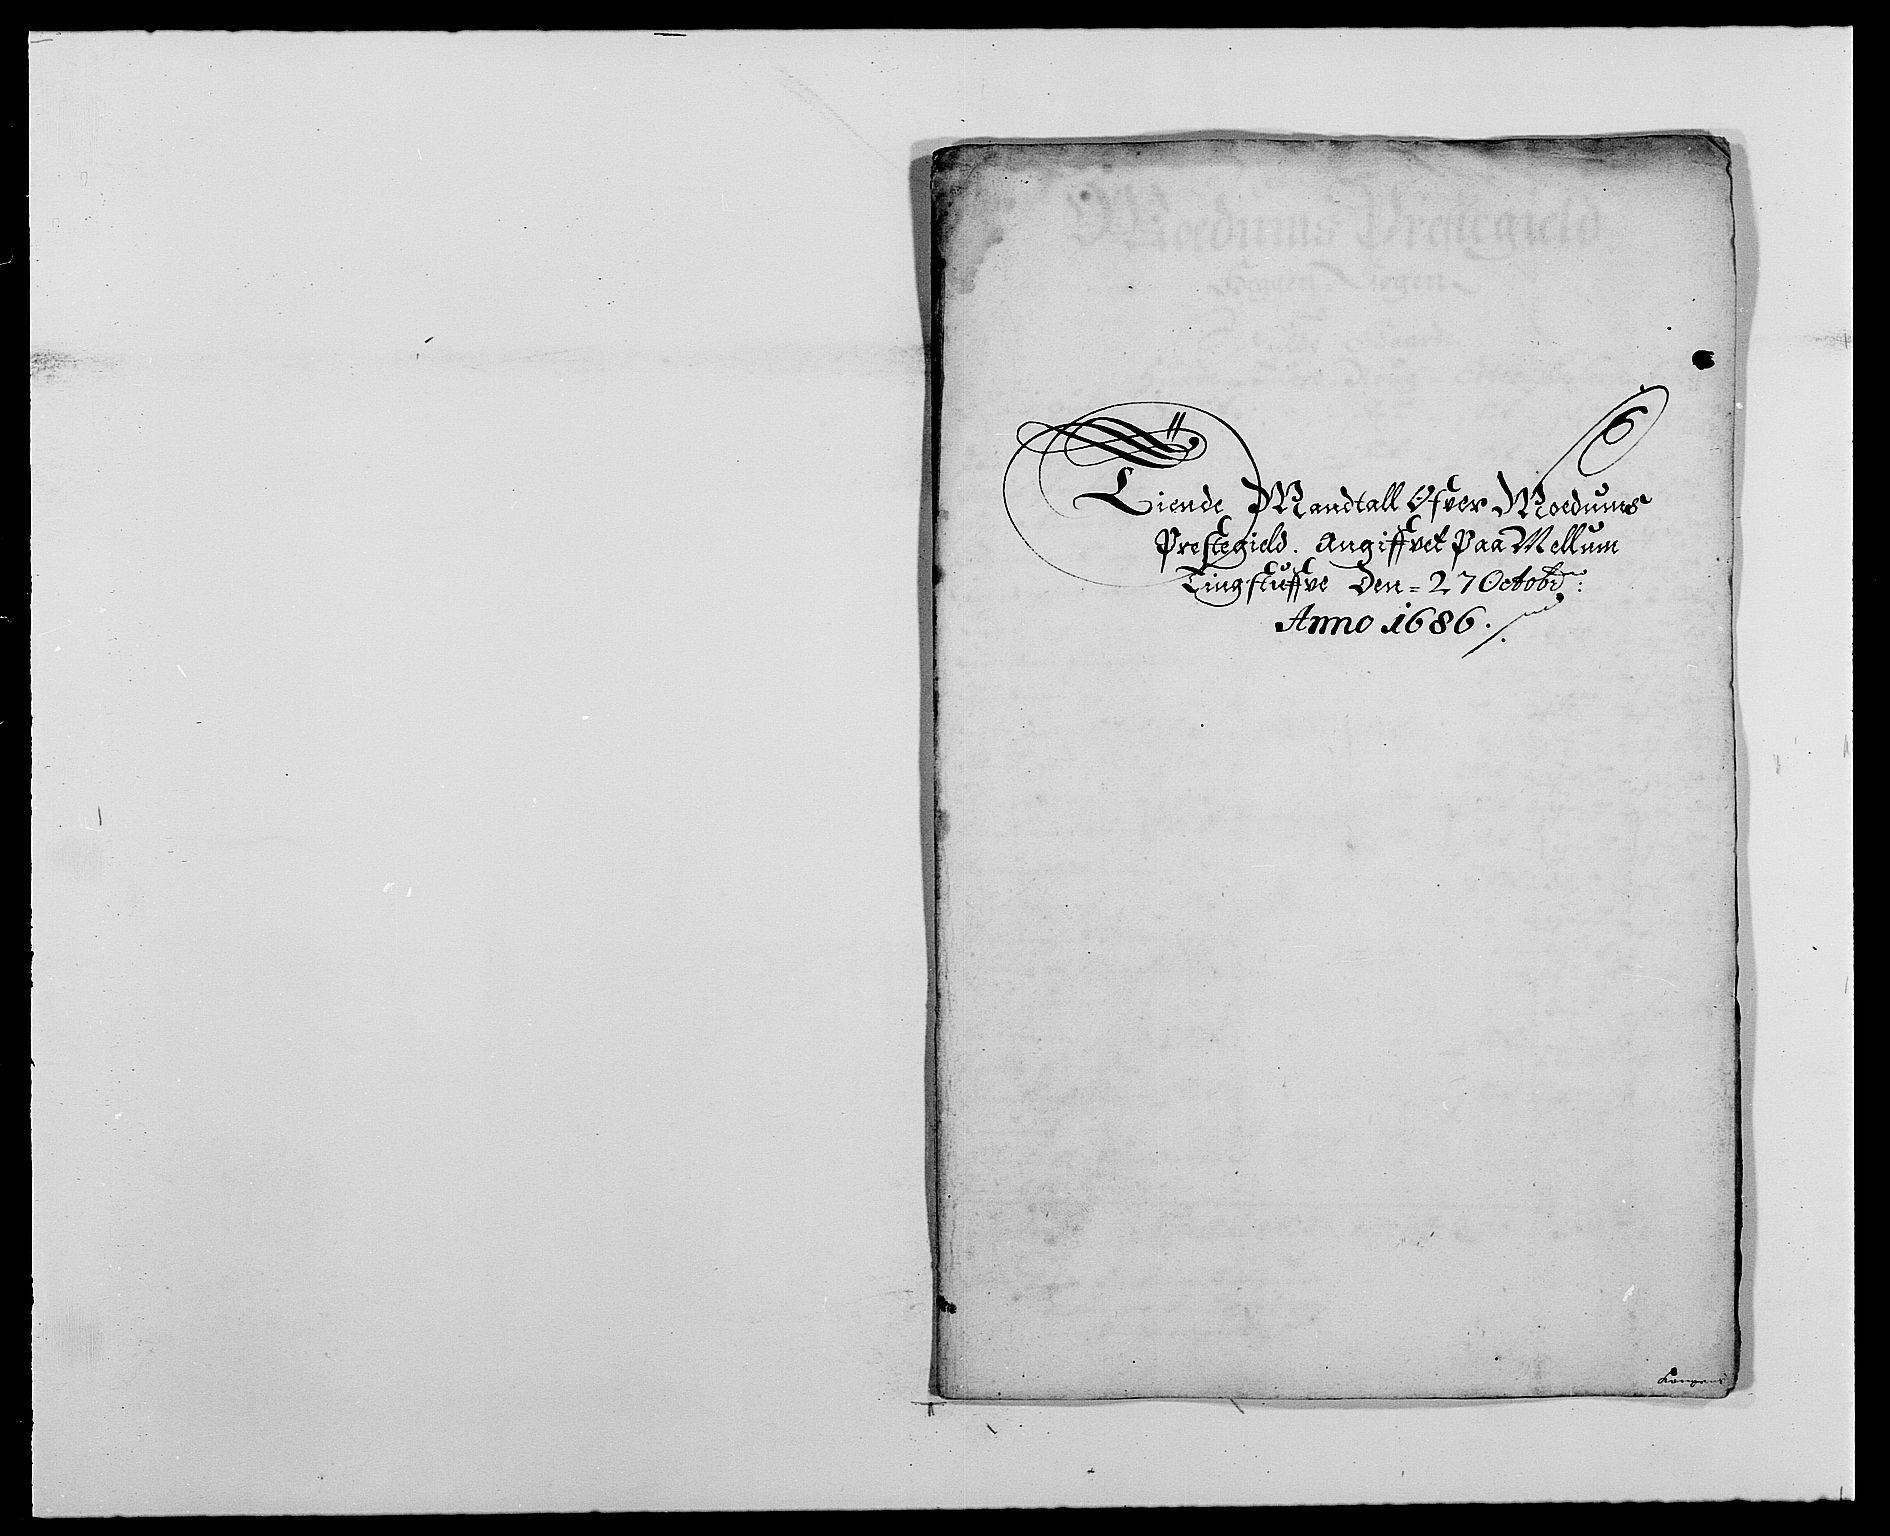 RA, Rentekammeret inntil 1814, Reviderte regnskaper, Fogderegnskap, R25/L1678: Fogderegnskap Buskerud, 1685-1686, s. 383